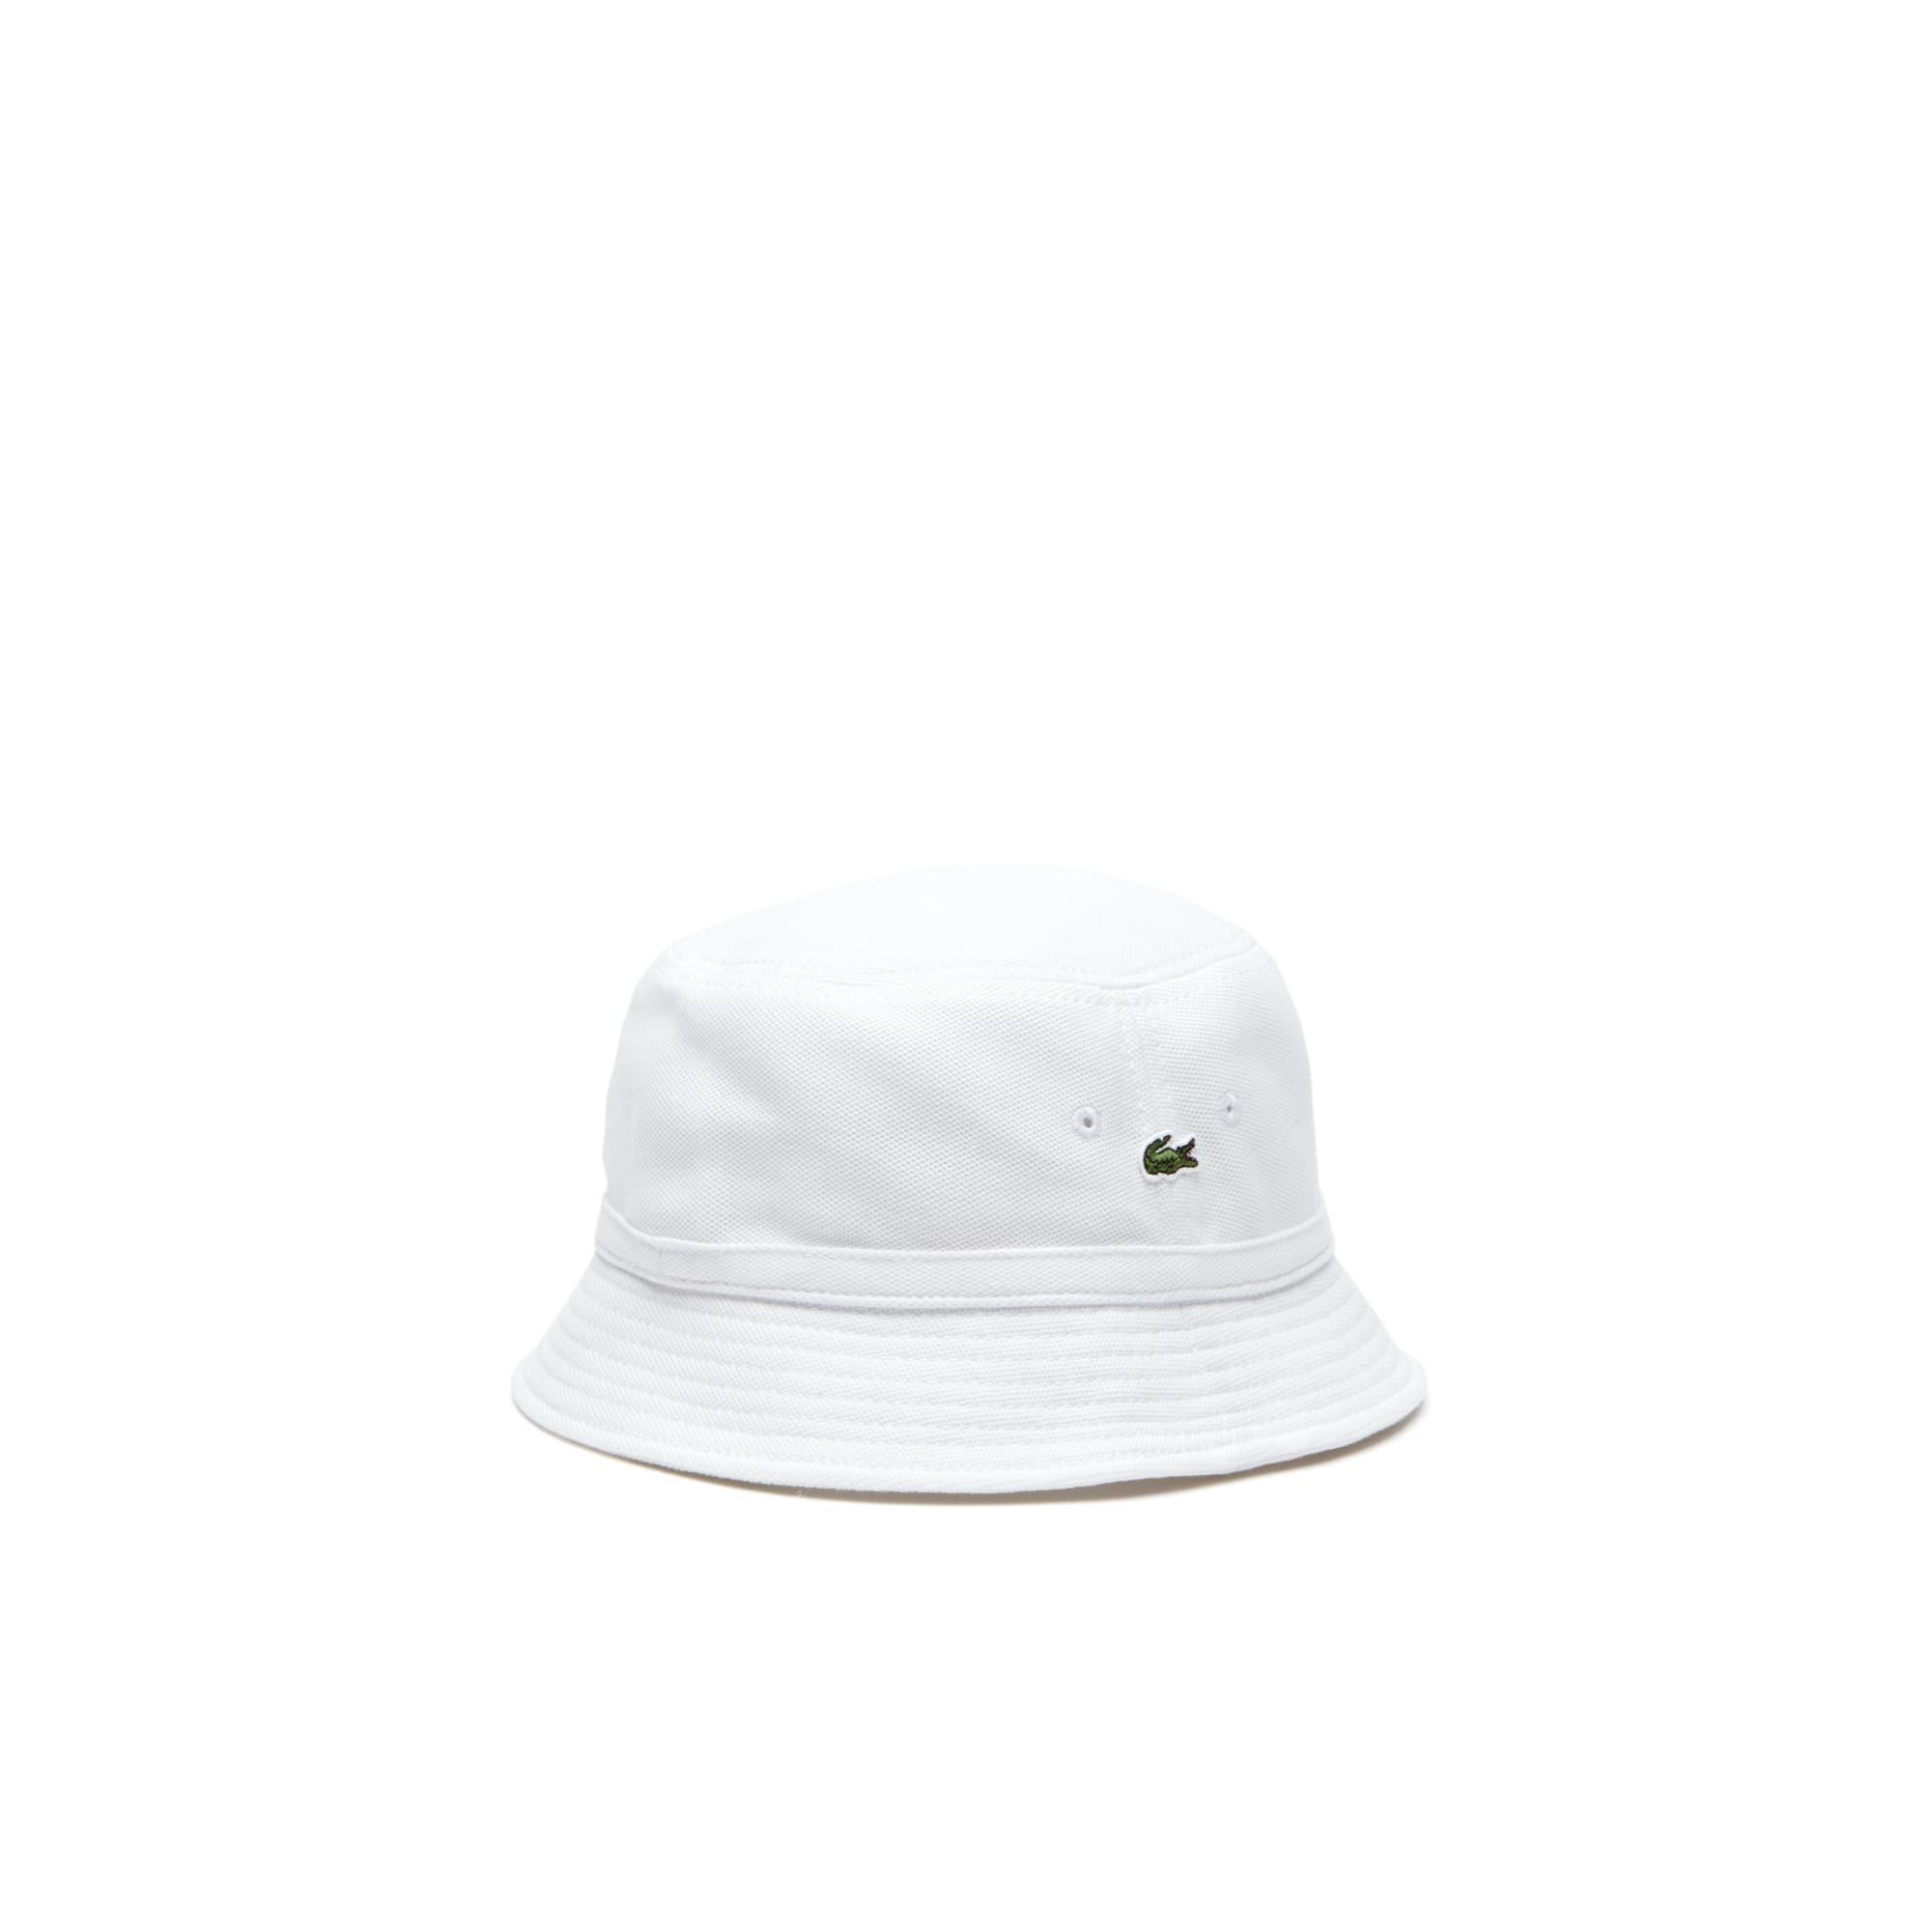 Lacoste Men S Cotton PiquÉ Bucket Hat In White  9a46ca20b891